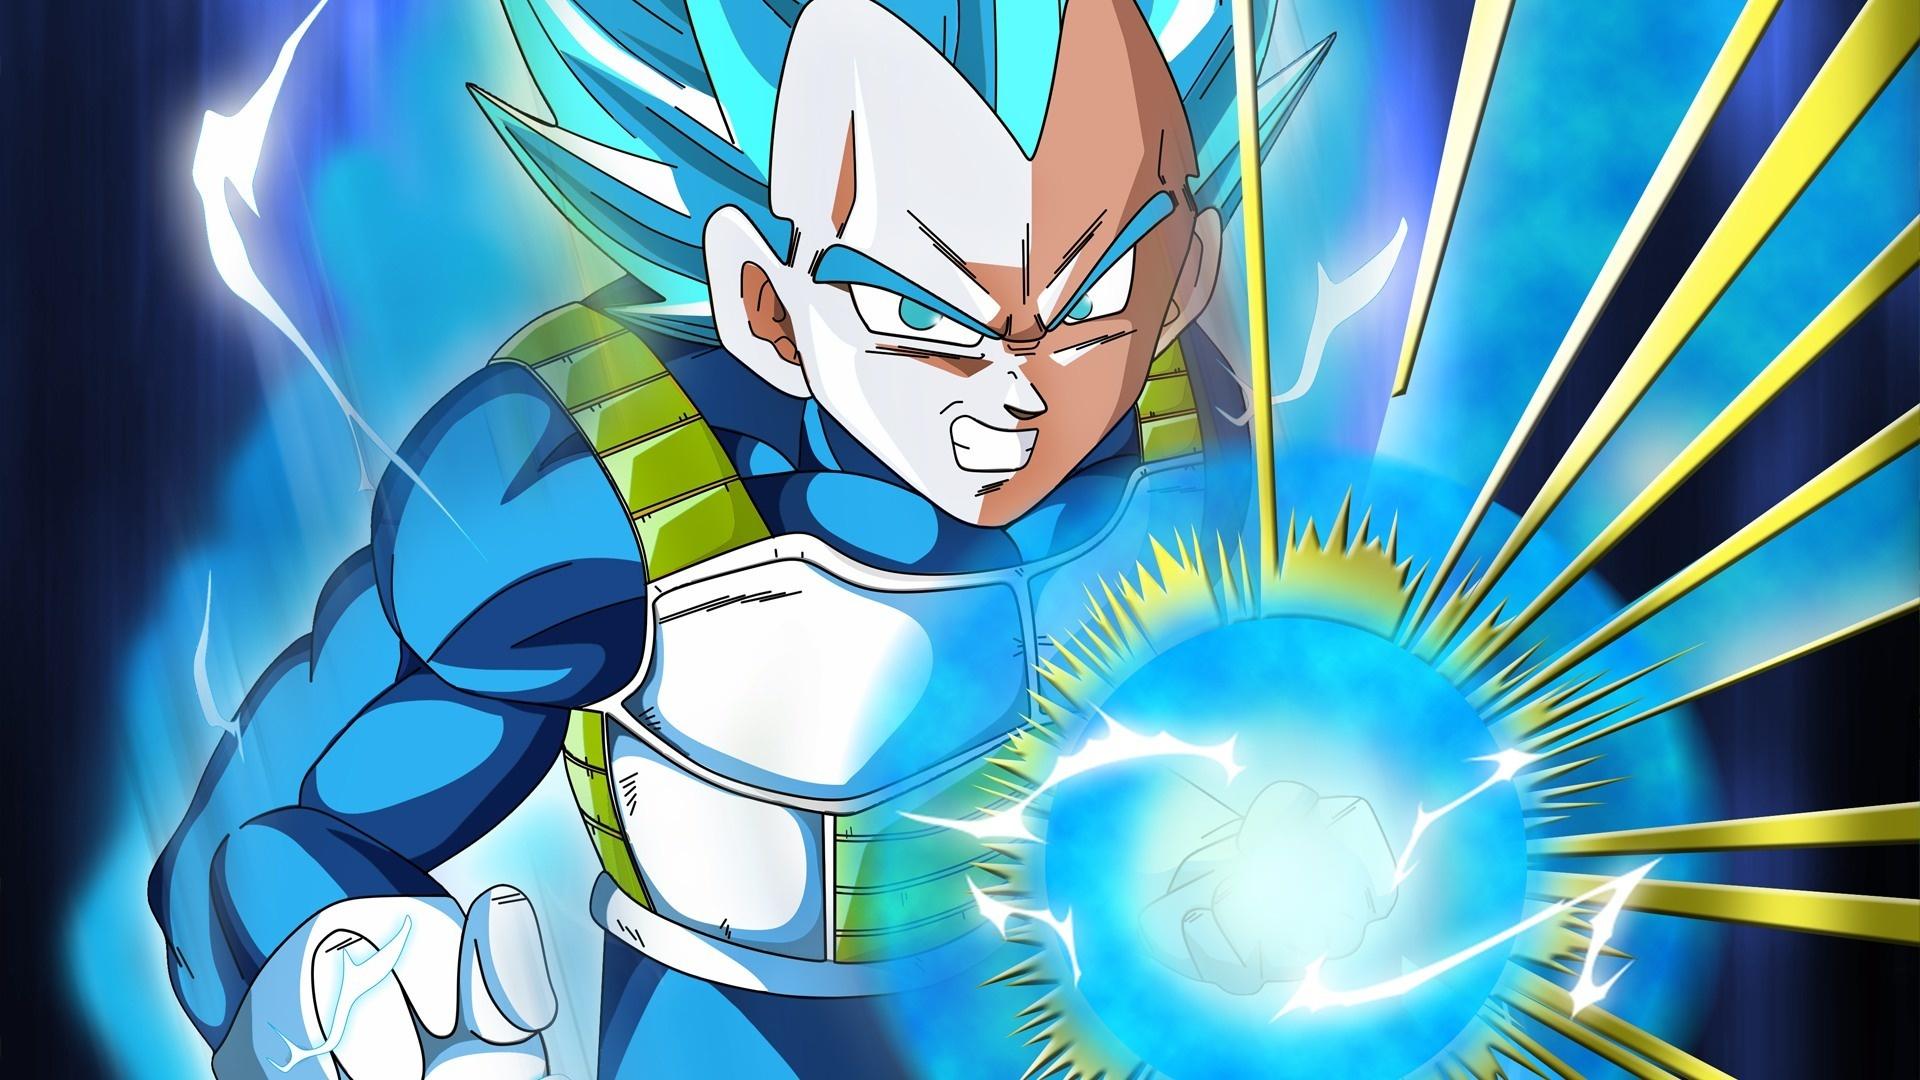 Download 1920x1080 Wallpaper Blue Power Dragon Ball Super Vegeta Full Hd Hdtv Fhd 1080p 1920x1080 Hd Image Background 8006